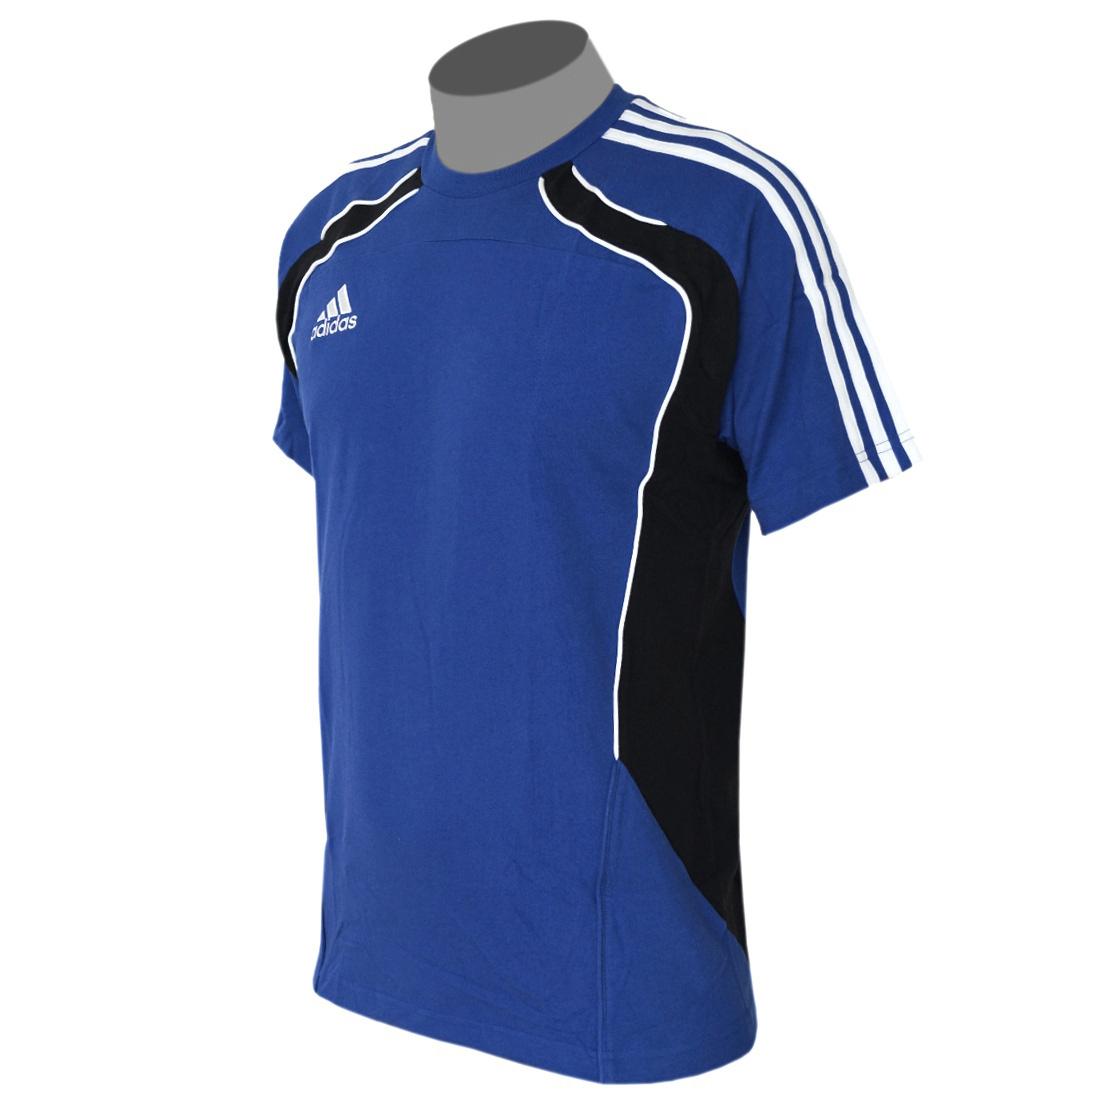 adidas condivo herren t shirt blau trikot trainingsshirt. Black Bedroom Furniture Sets. Home Design Ideas